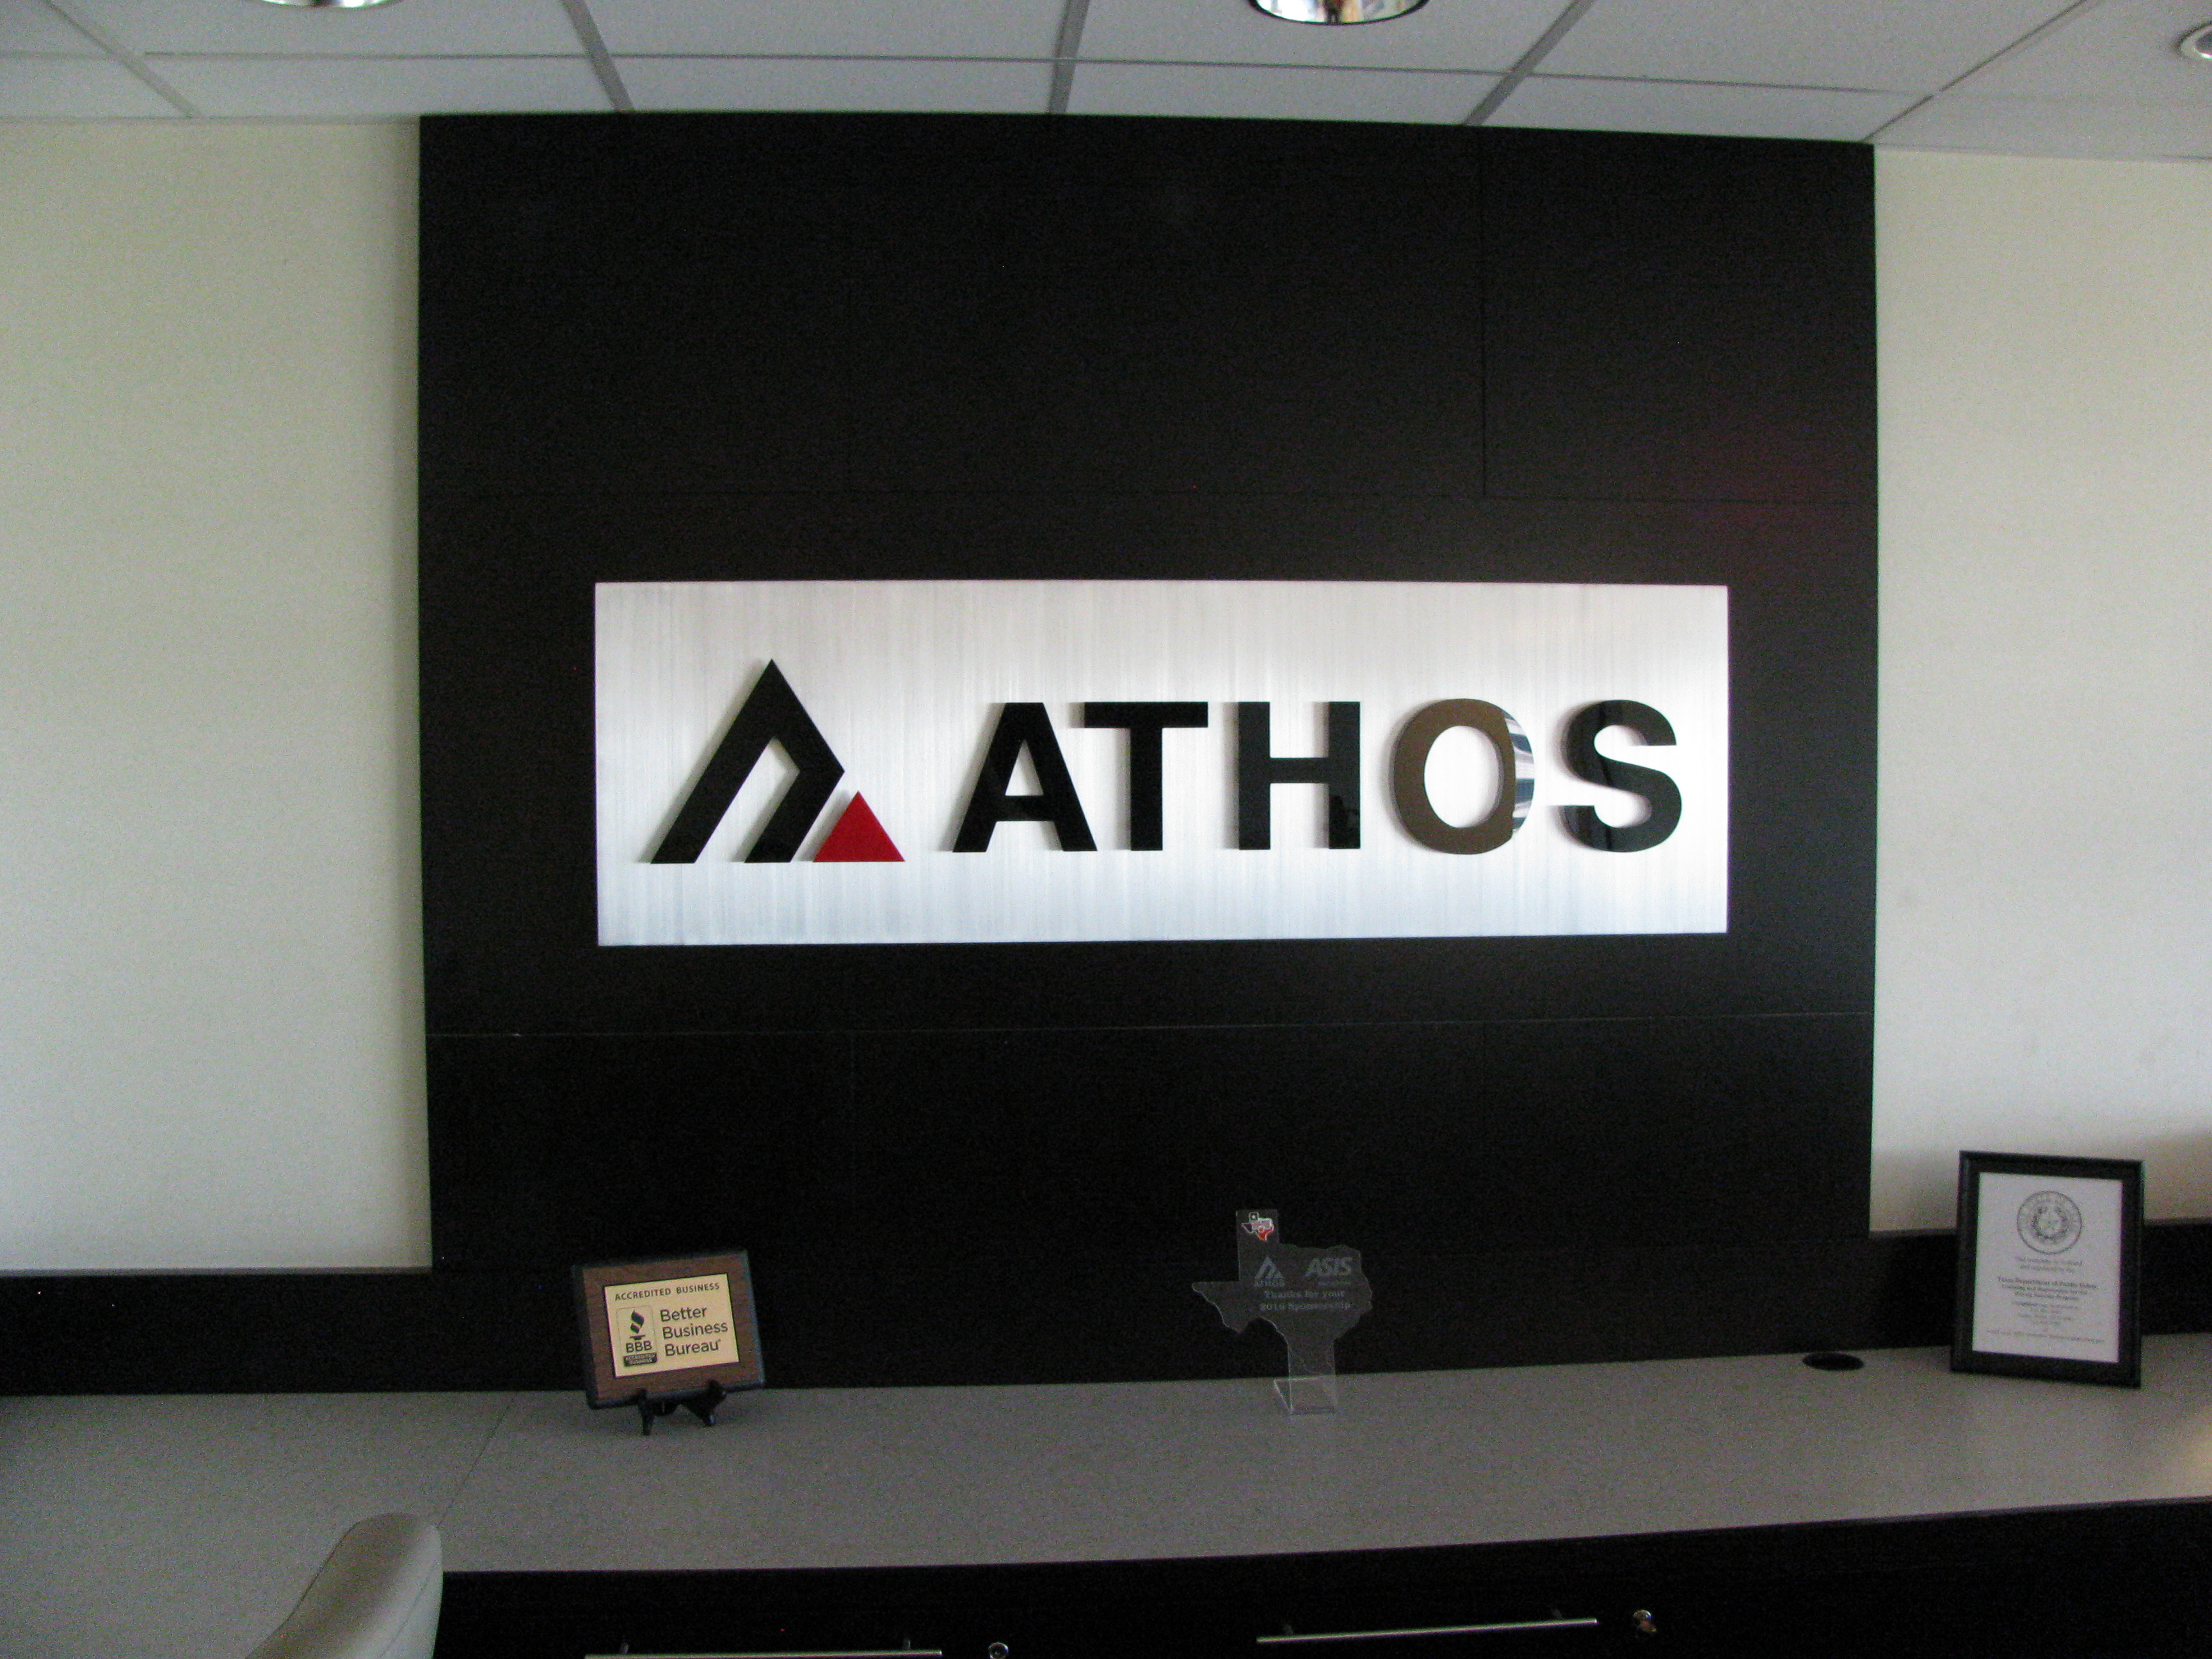 Athos reception sign